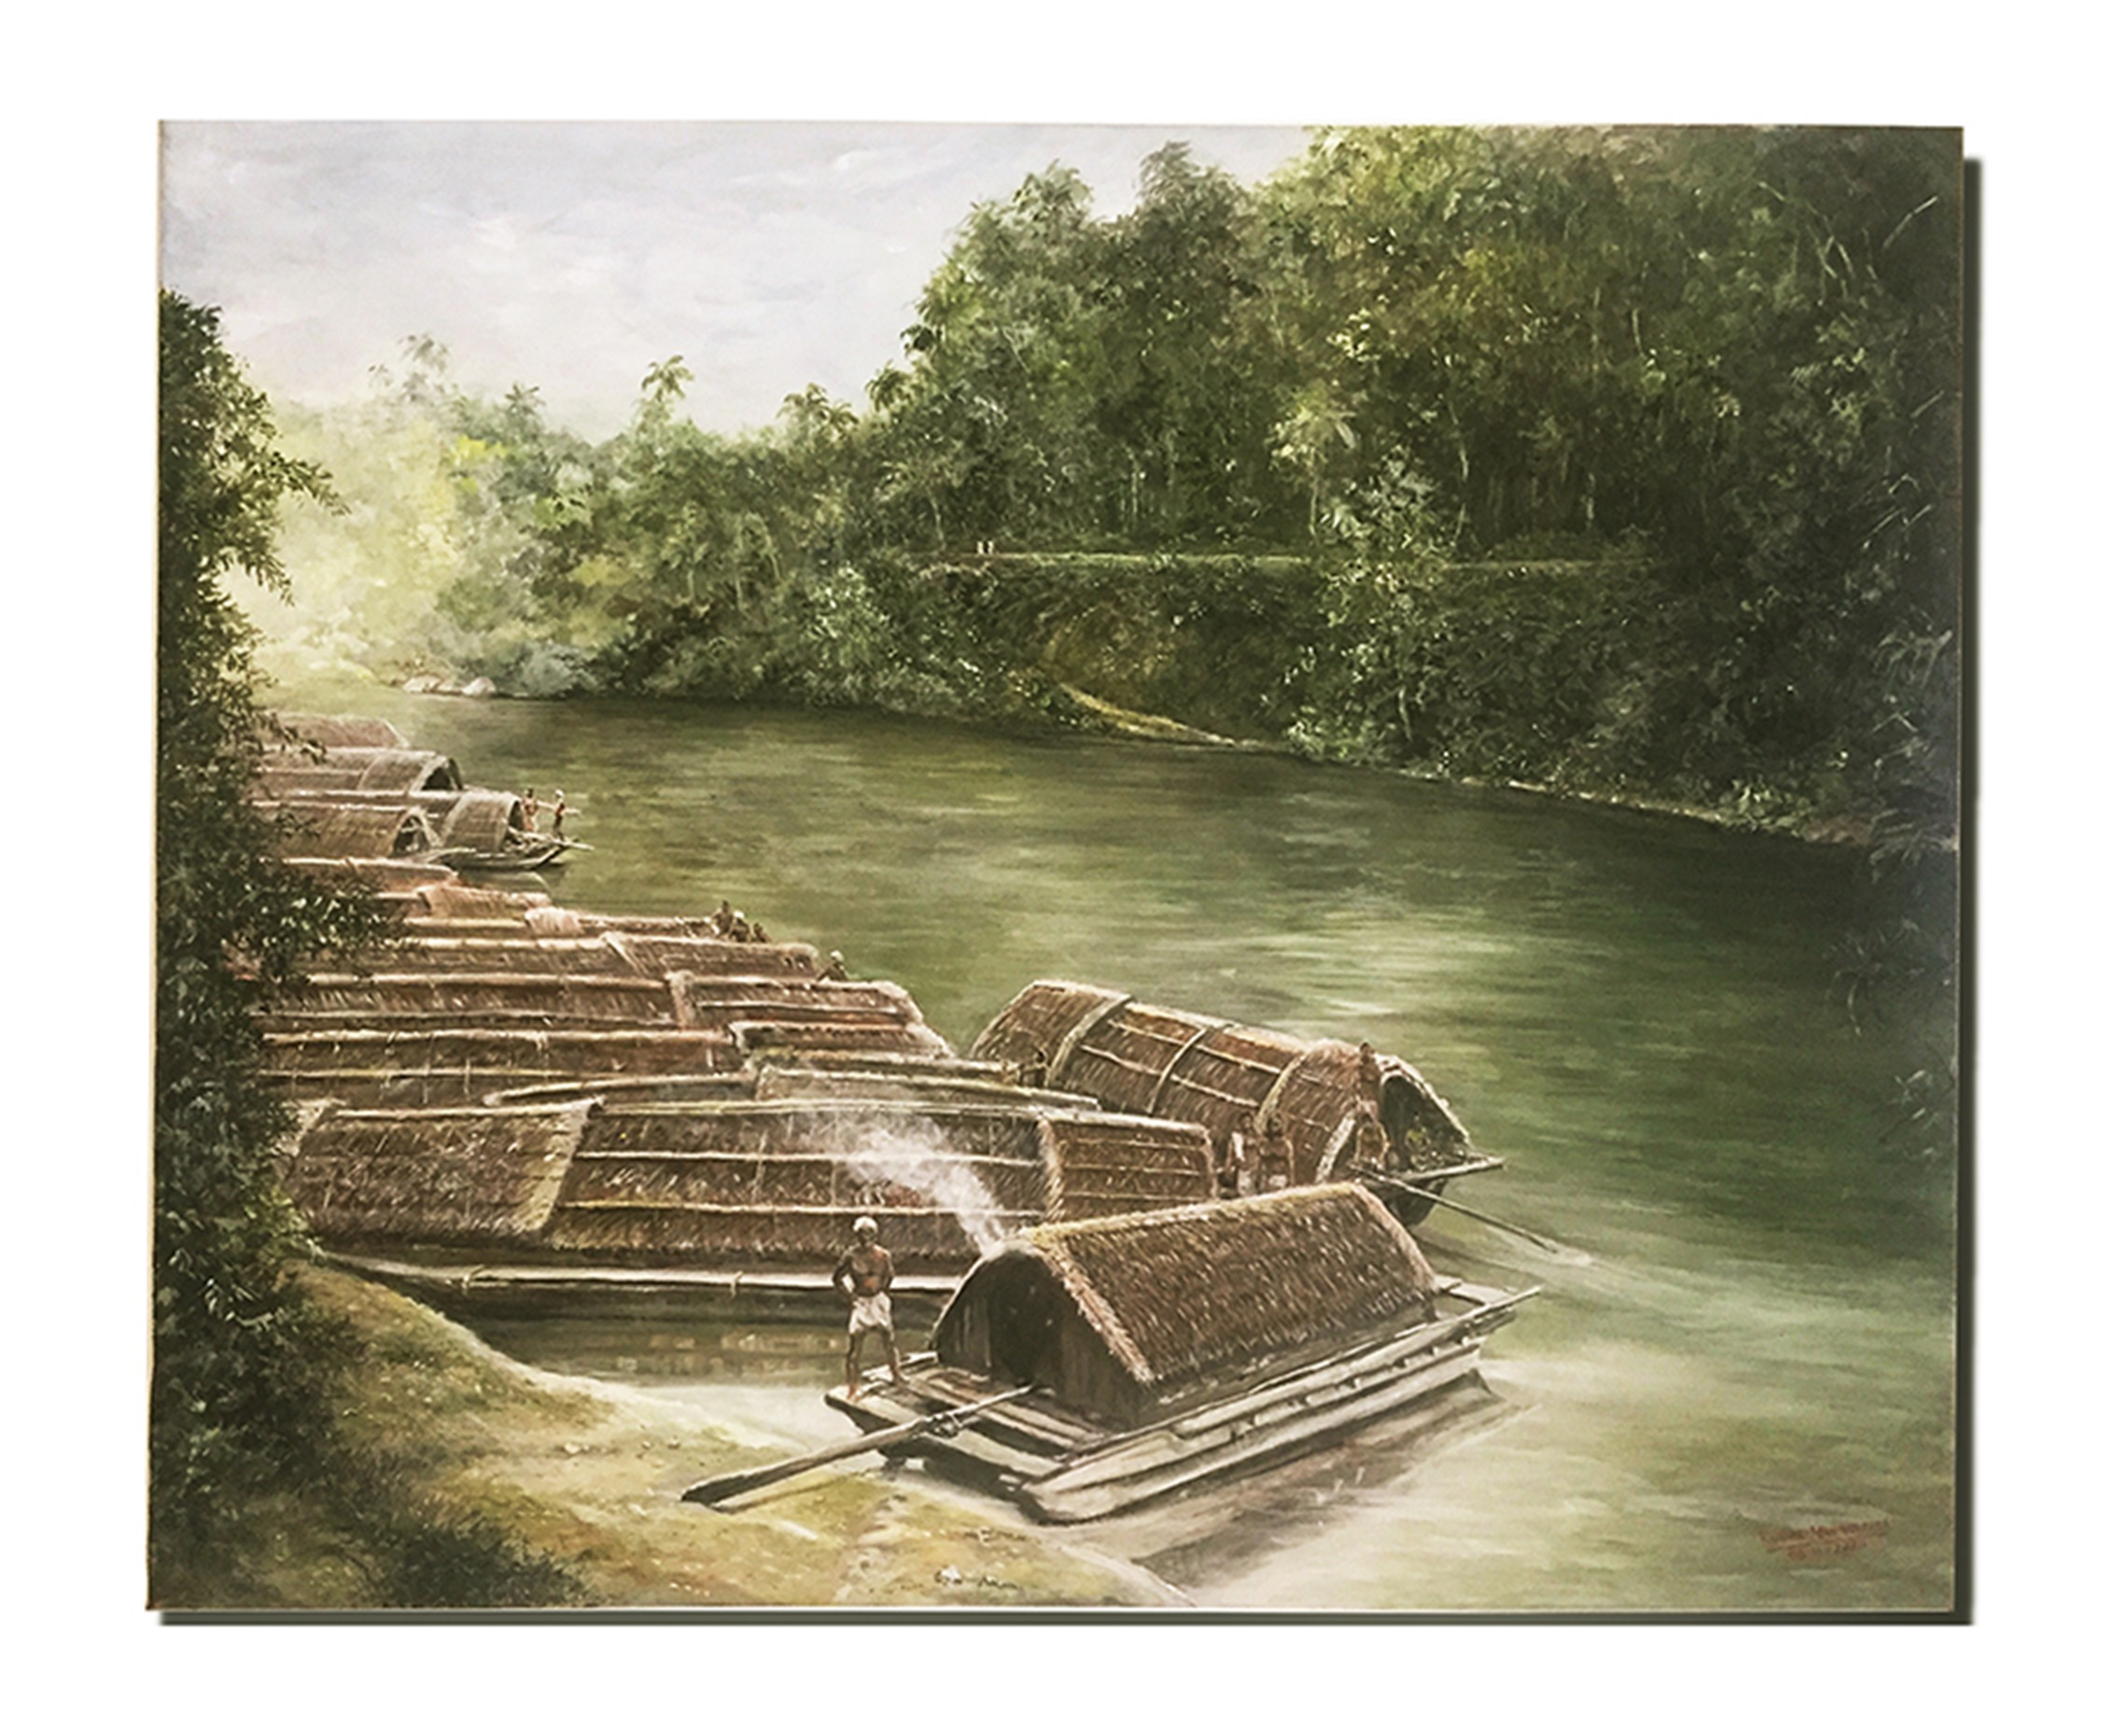 Ancient transport in Sri Lanka by RUWAN MAHINDAPALA